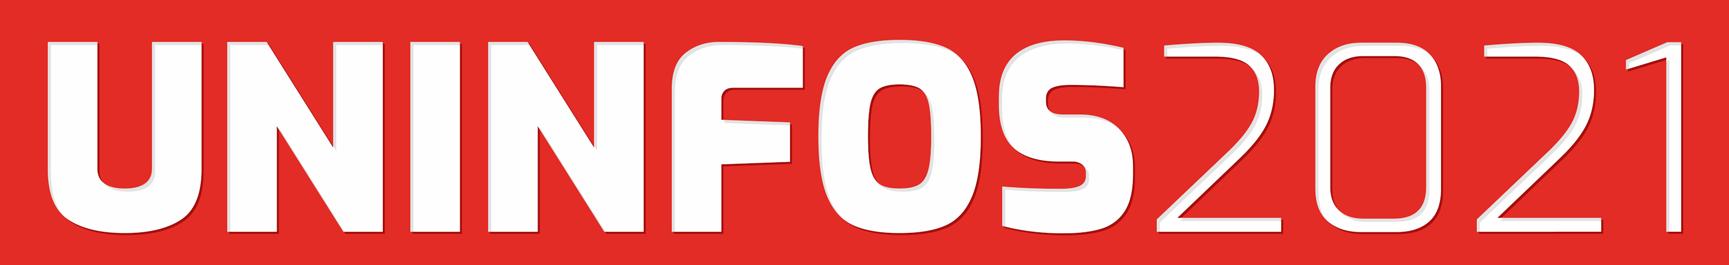 https://uninfos.uniza.sk/wp-content/uploads/2021/05/cropped-UNINFOS2021-logo.png